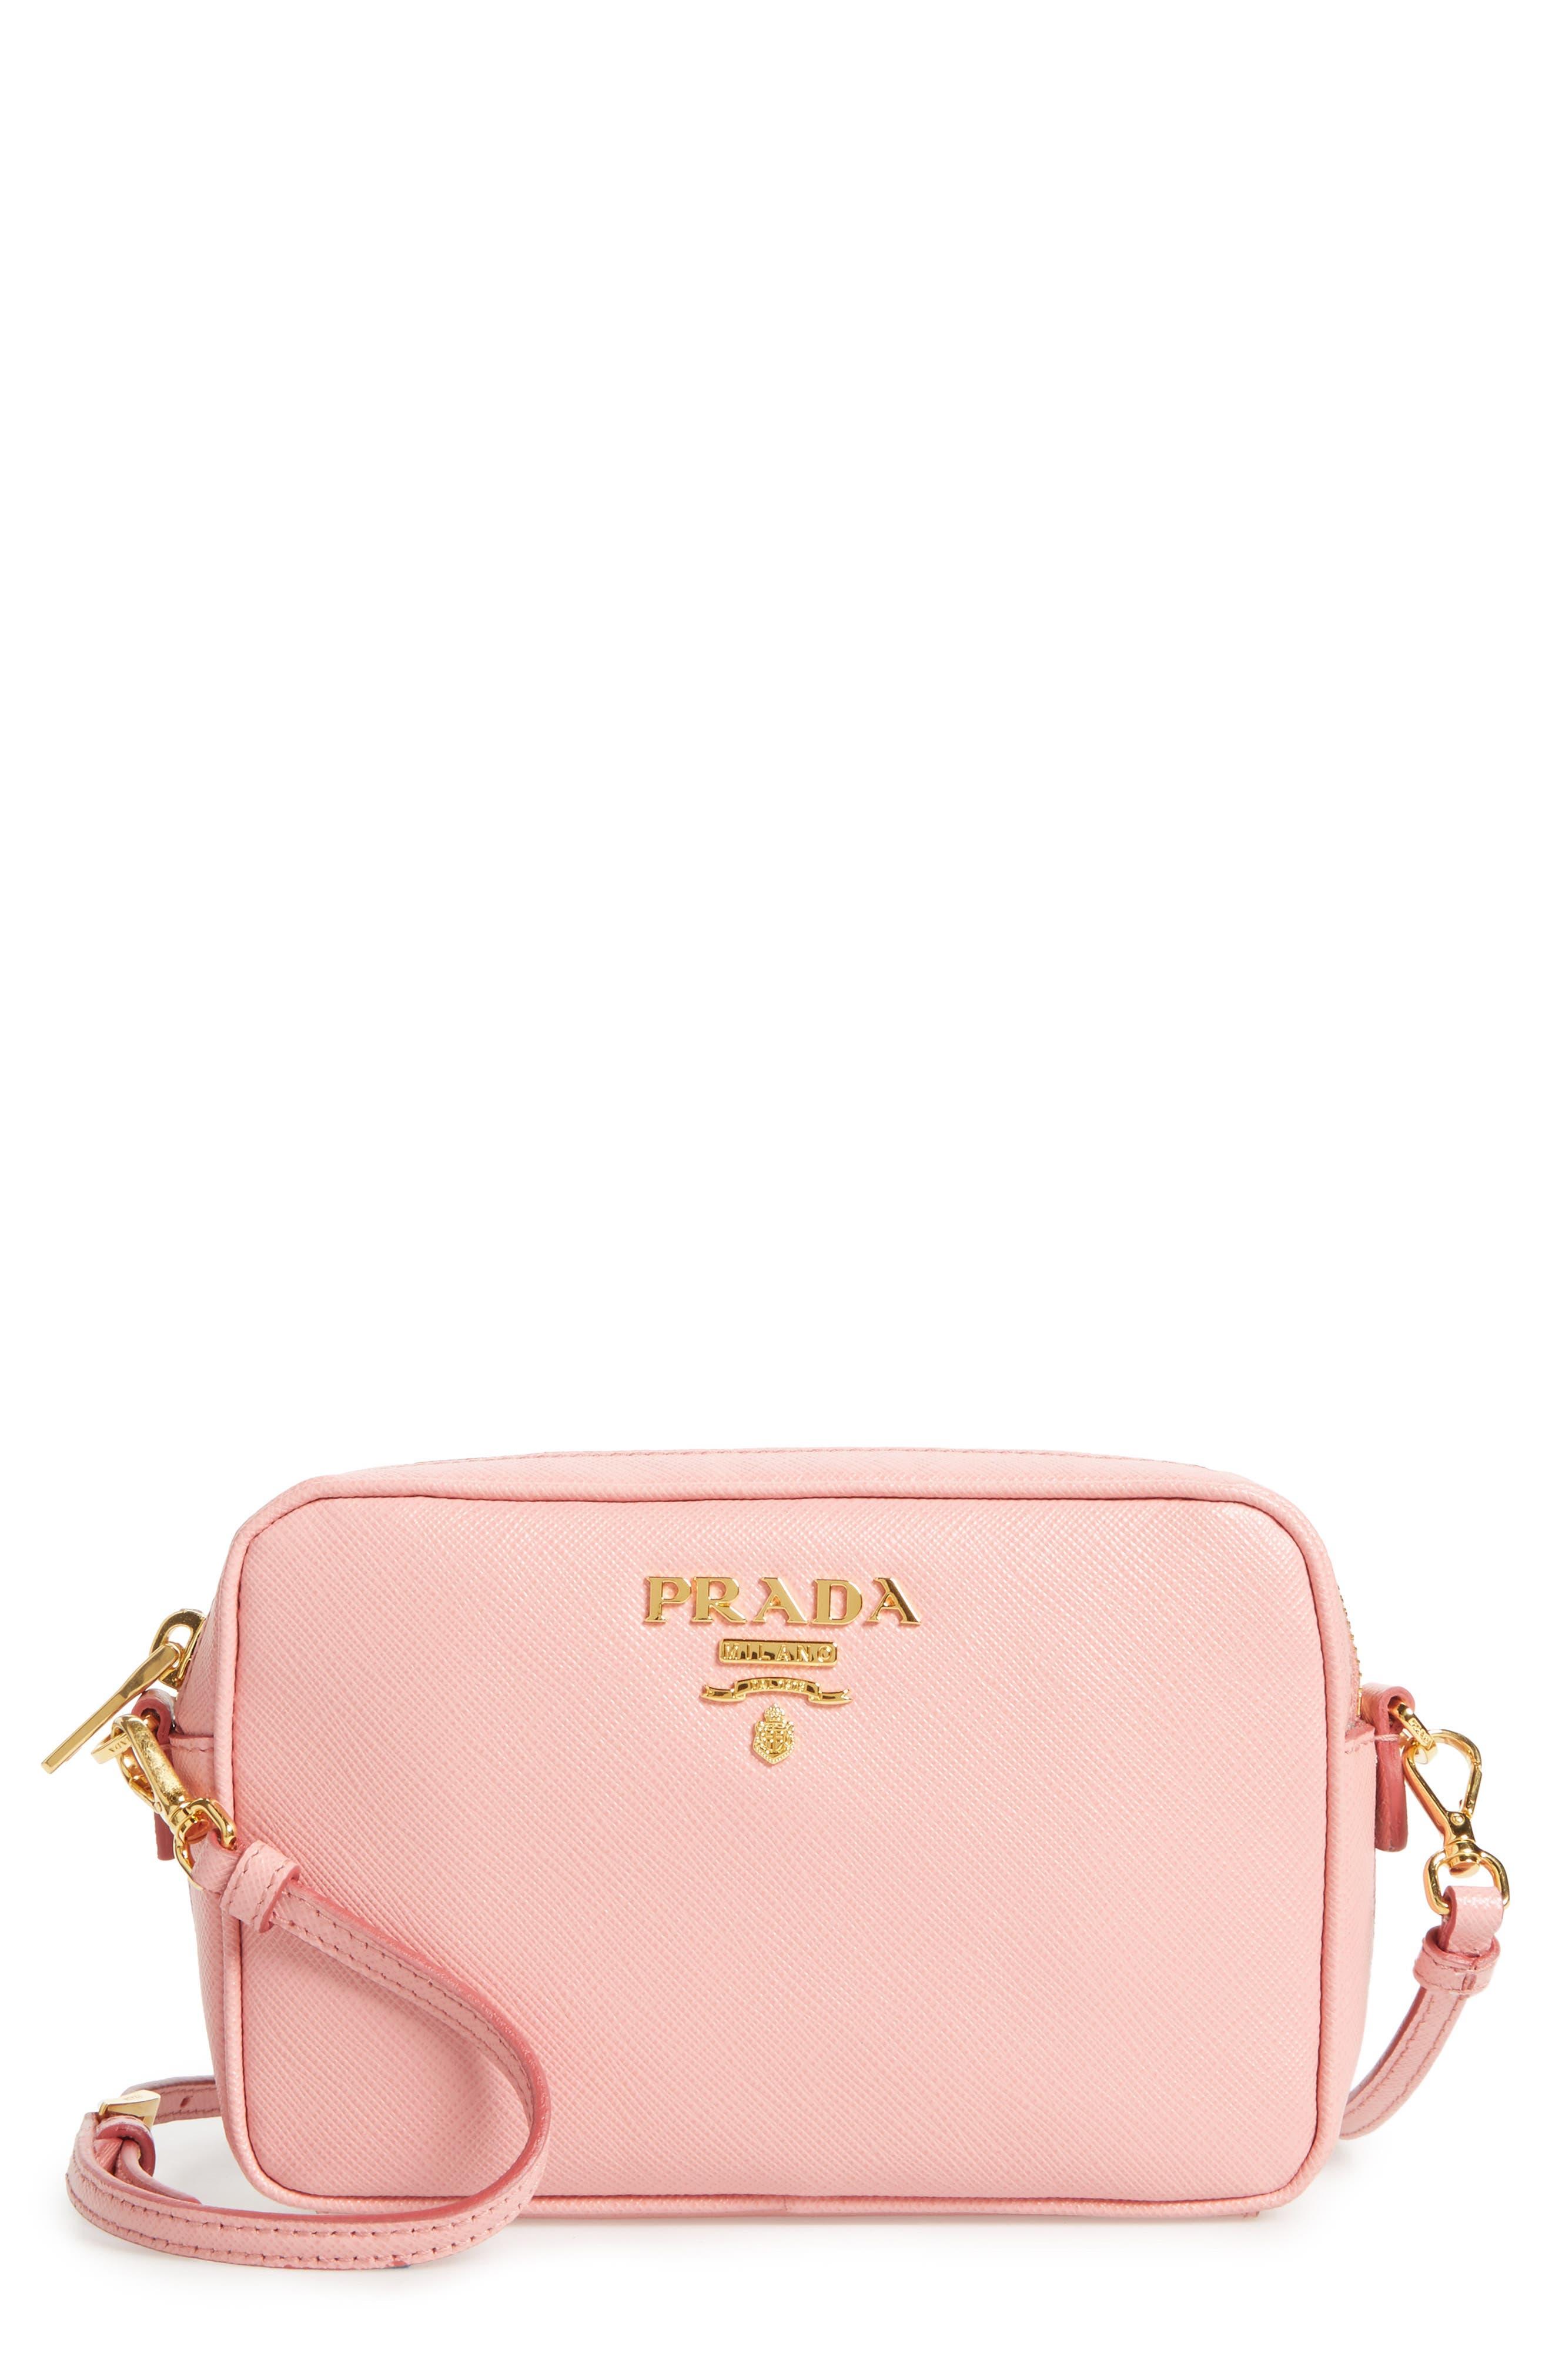 43c393b62070 Pink Prada: Shoes, Accessories & Fragrance | Nordstrom